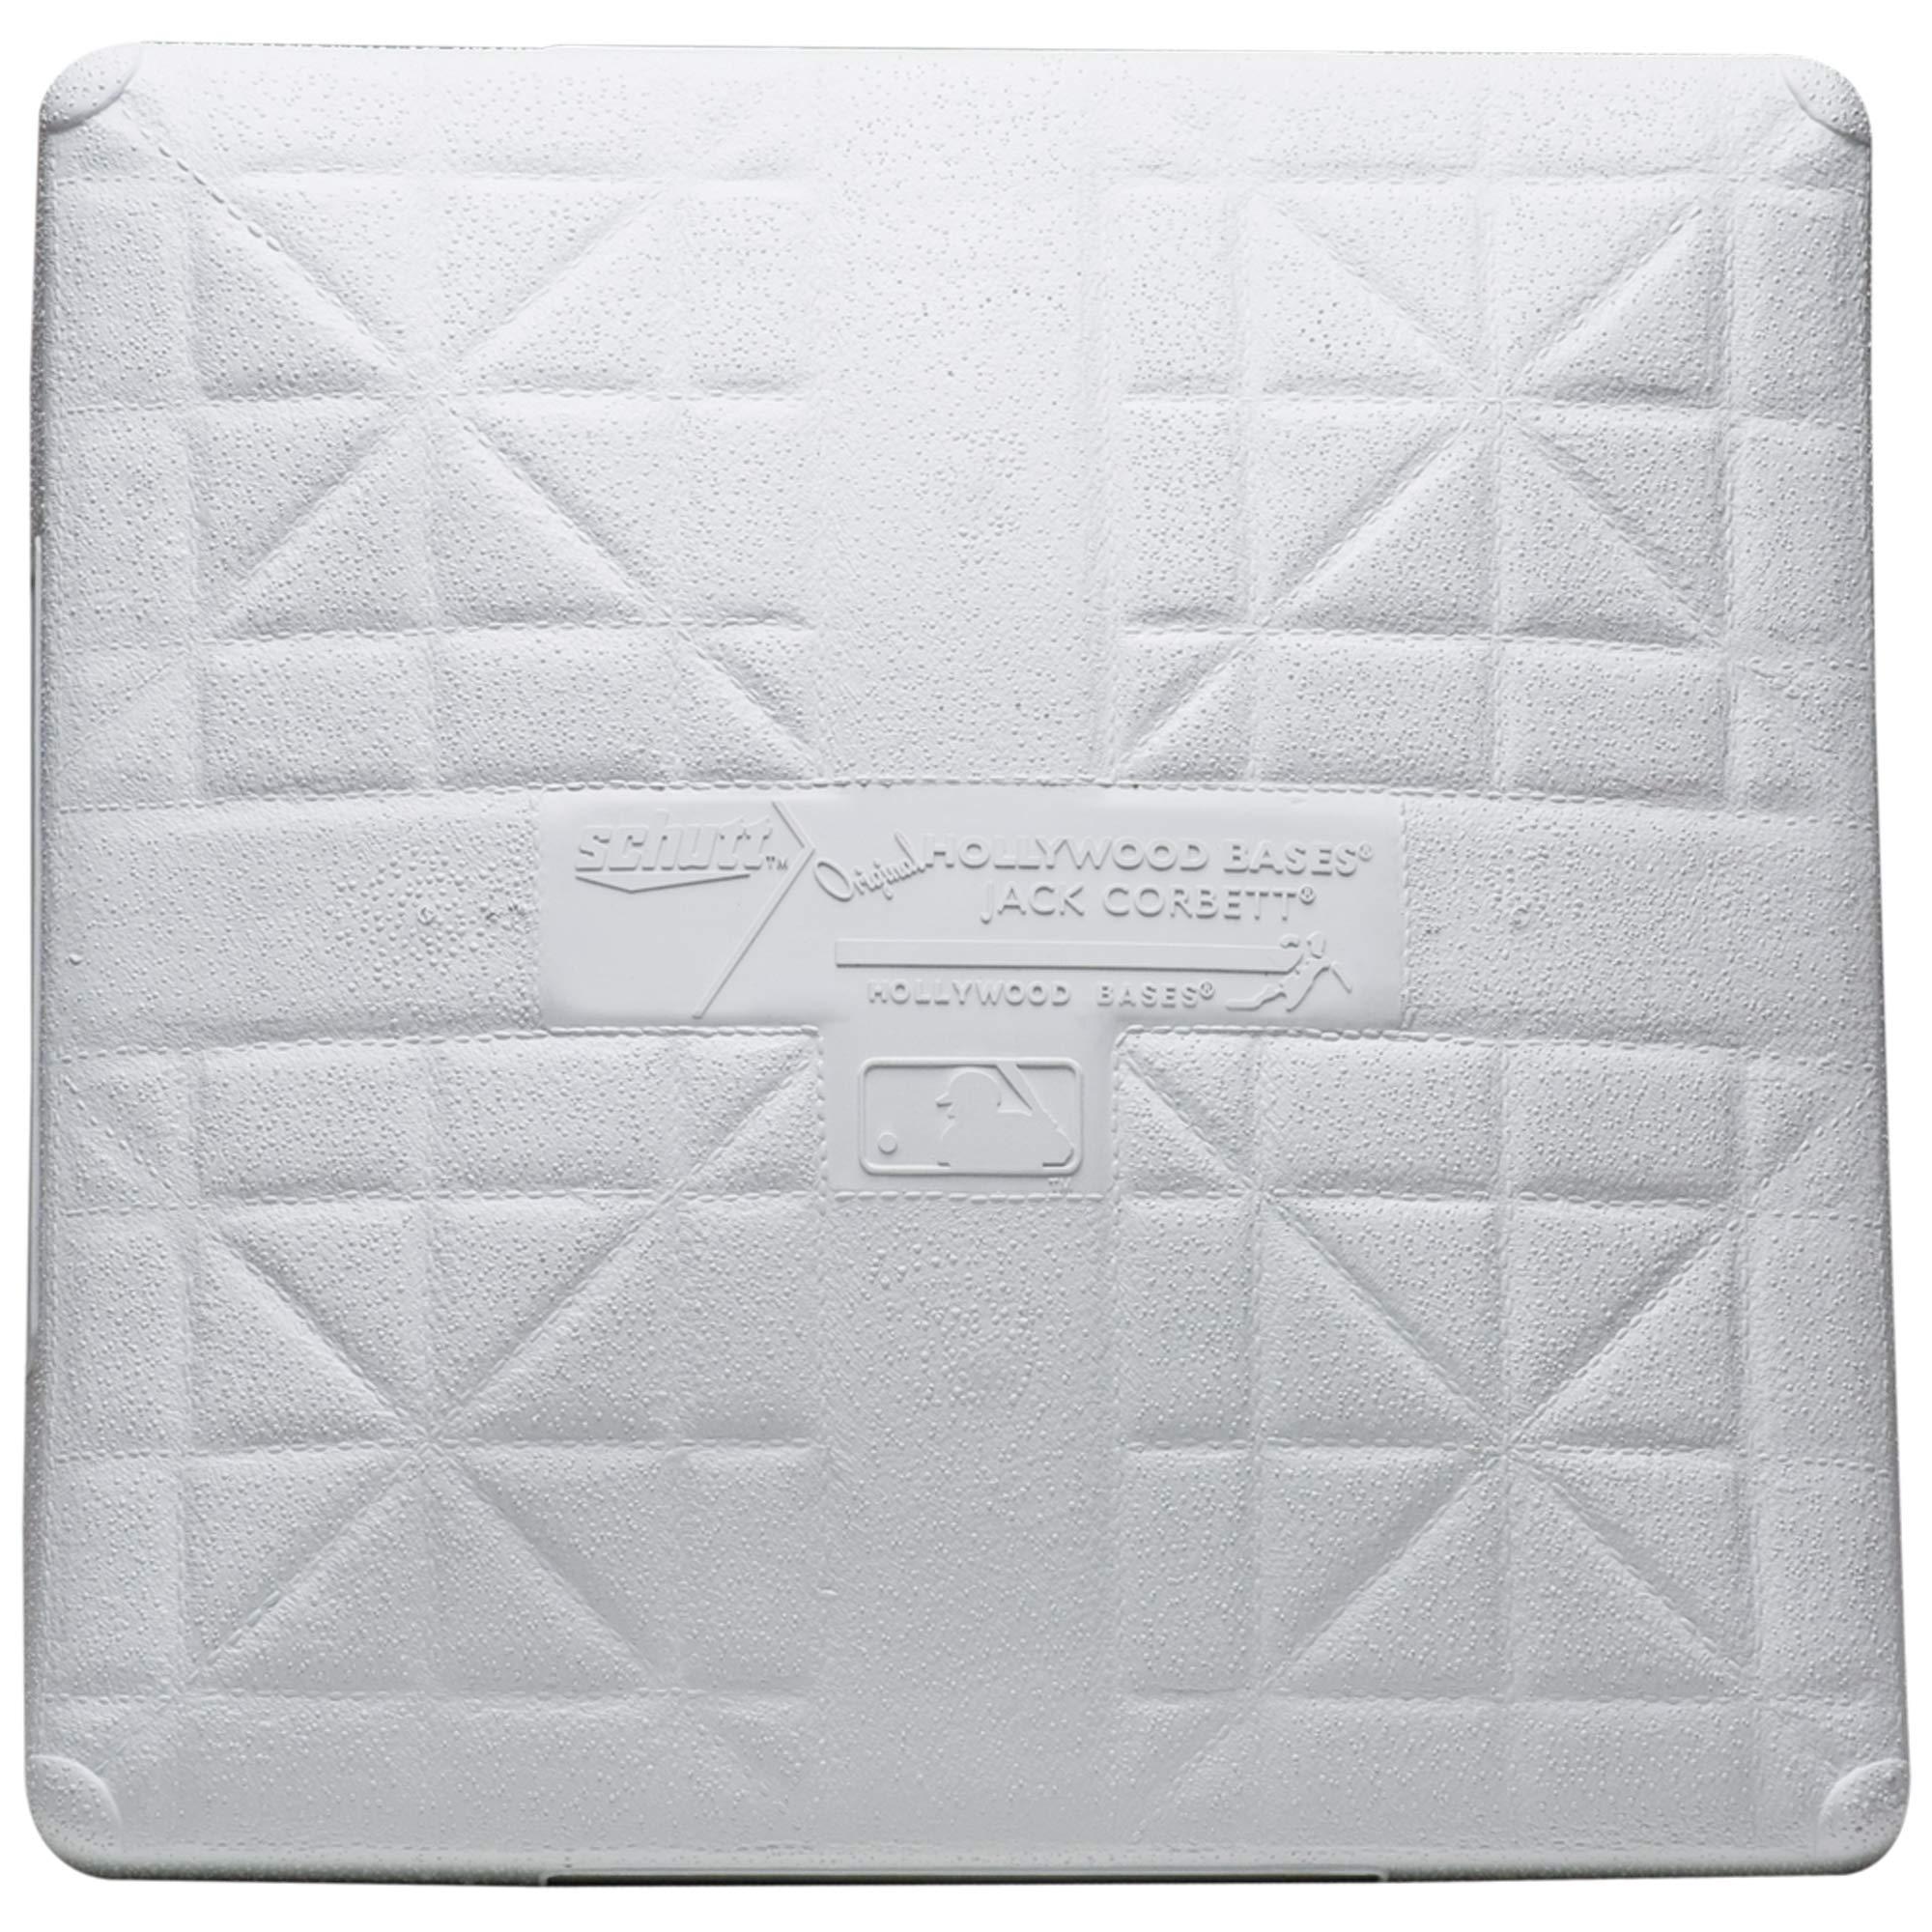 Schutt Sports Jack Corbett MLB Hollywood Base (Single Base) by Schutt